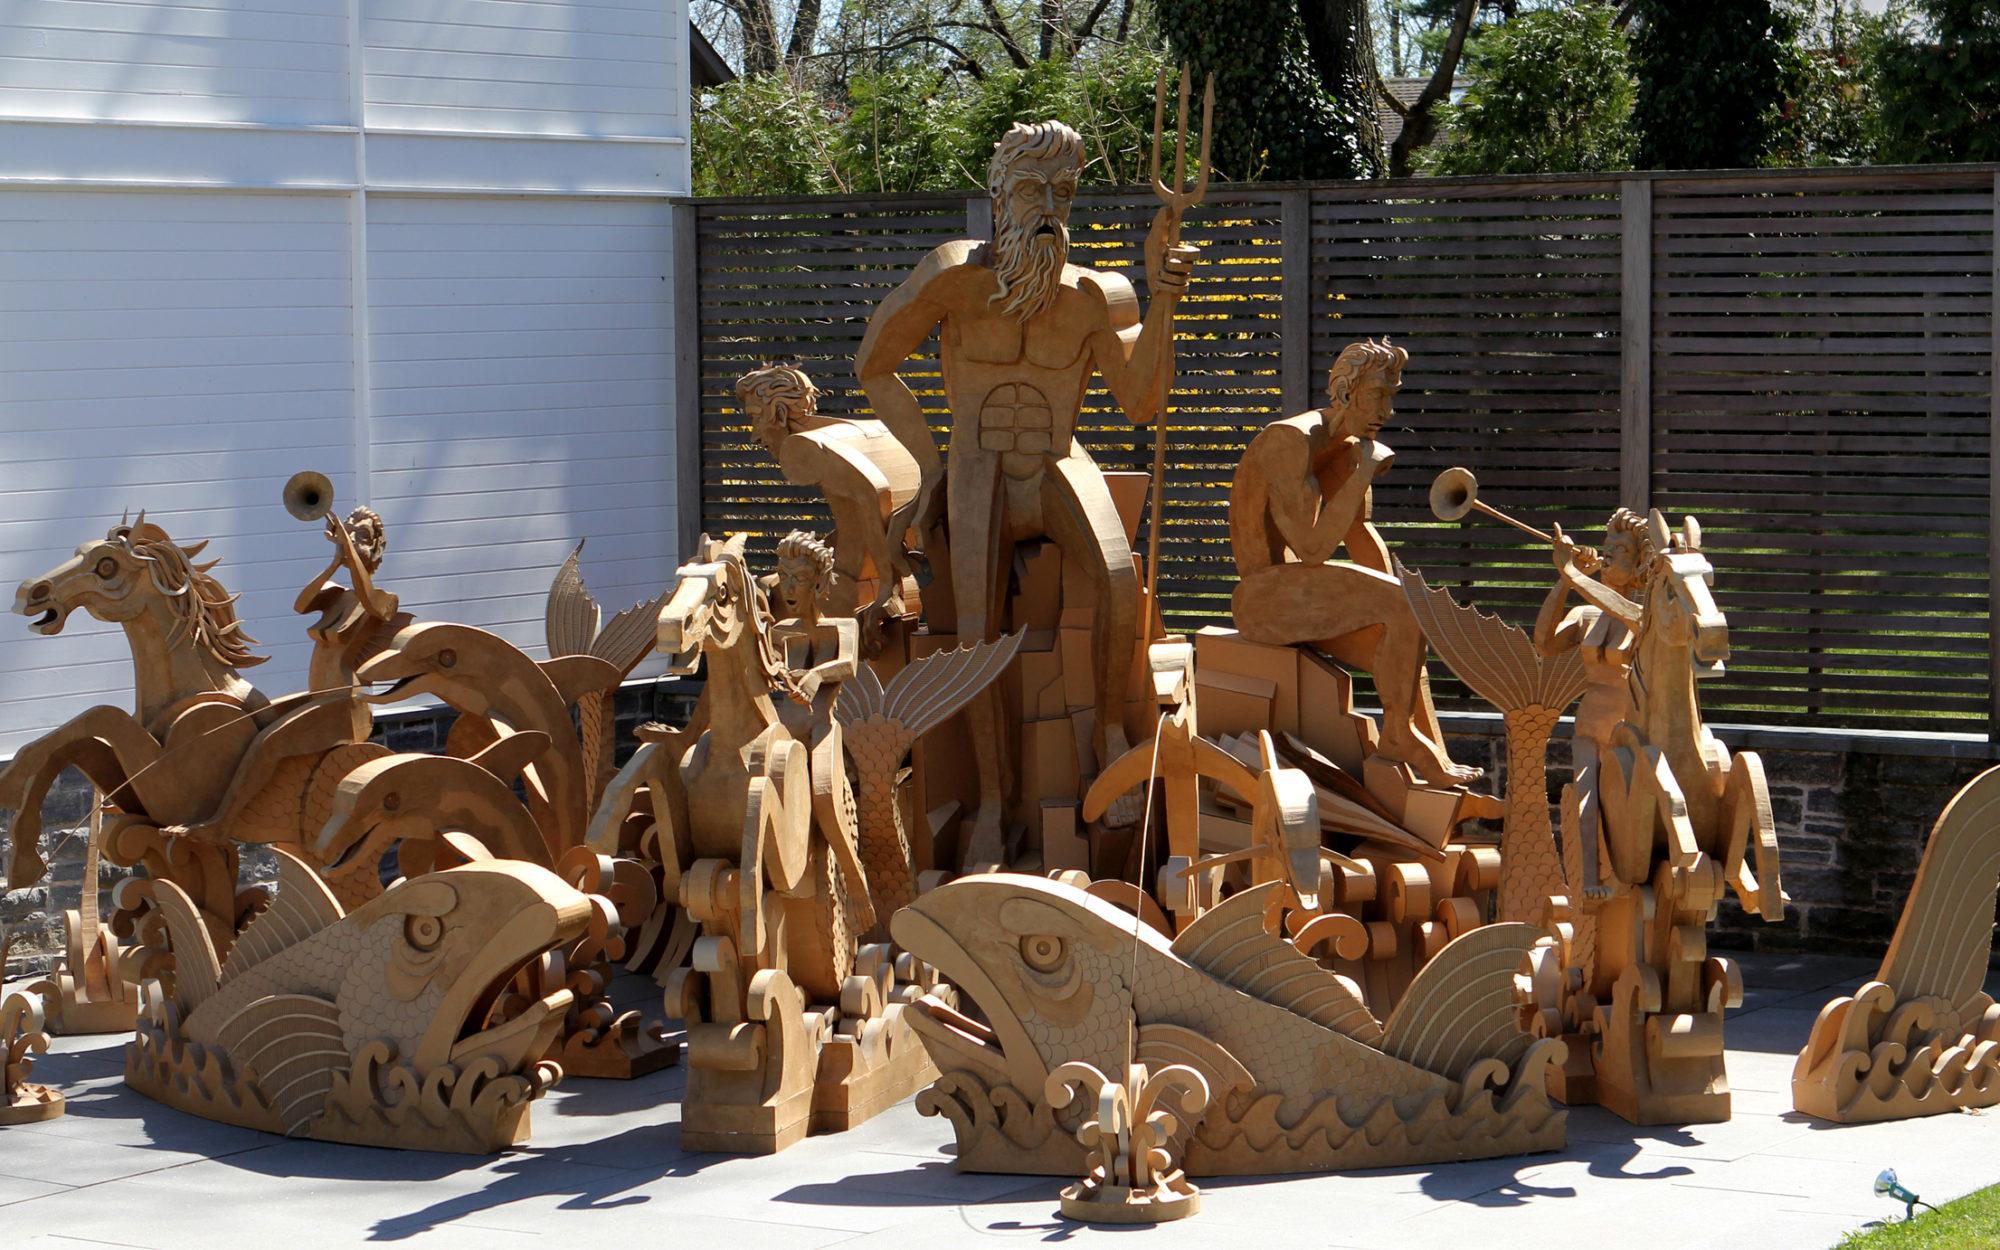 Cardboard cutouts of aquatic figures